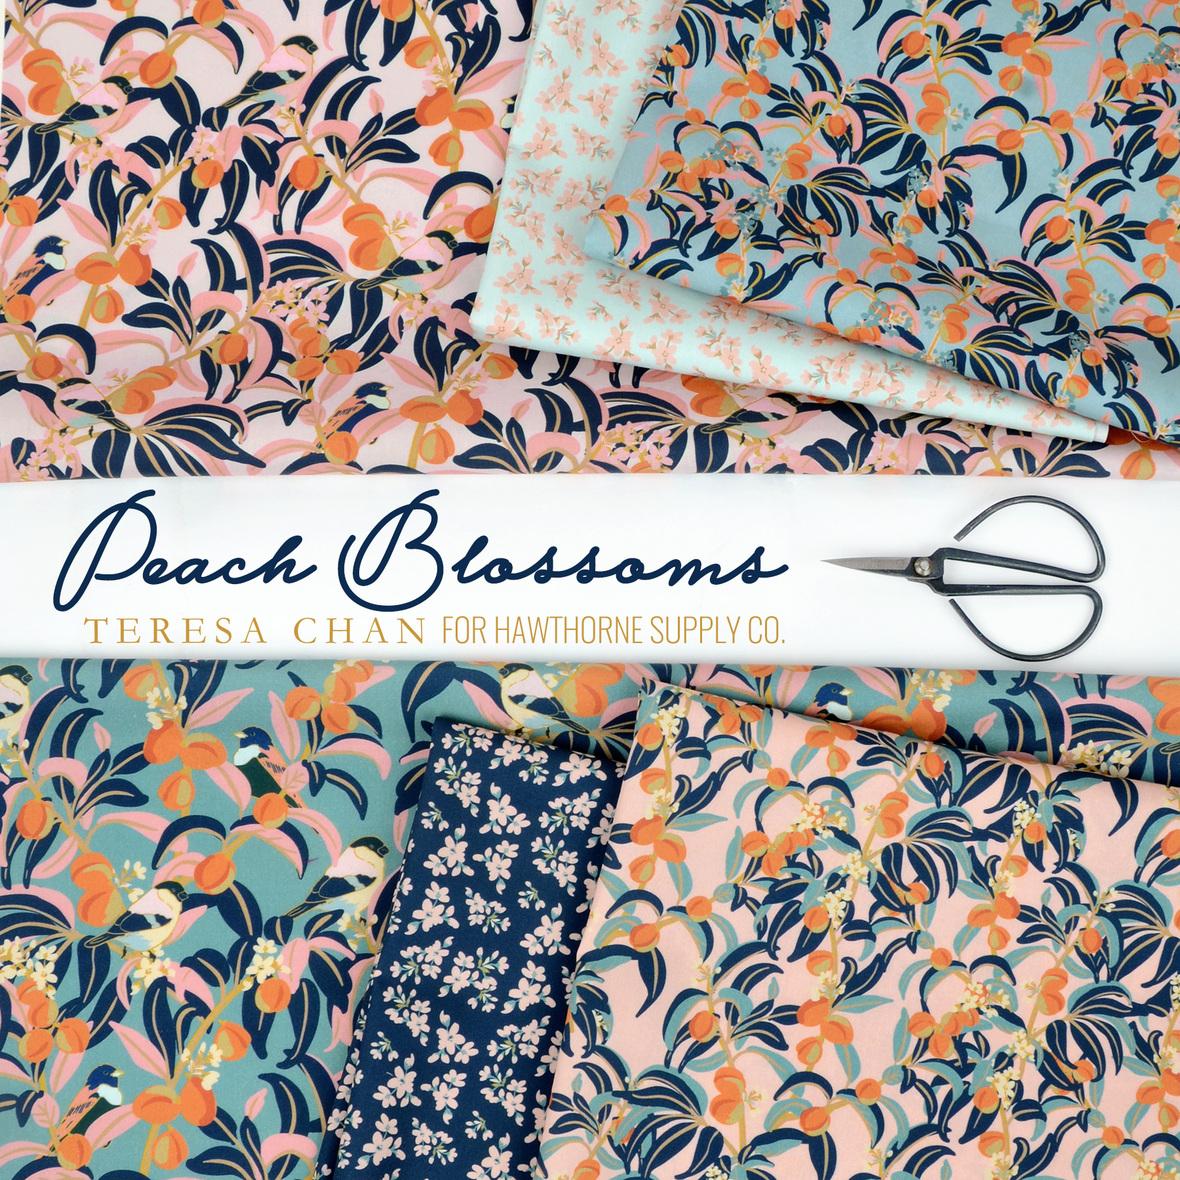 Peach-Blossoms-fabric-Teresa-Chan-for-Hawthorne-Supply-Co